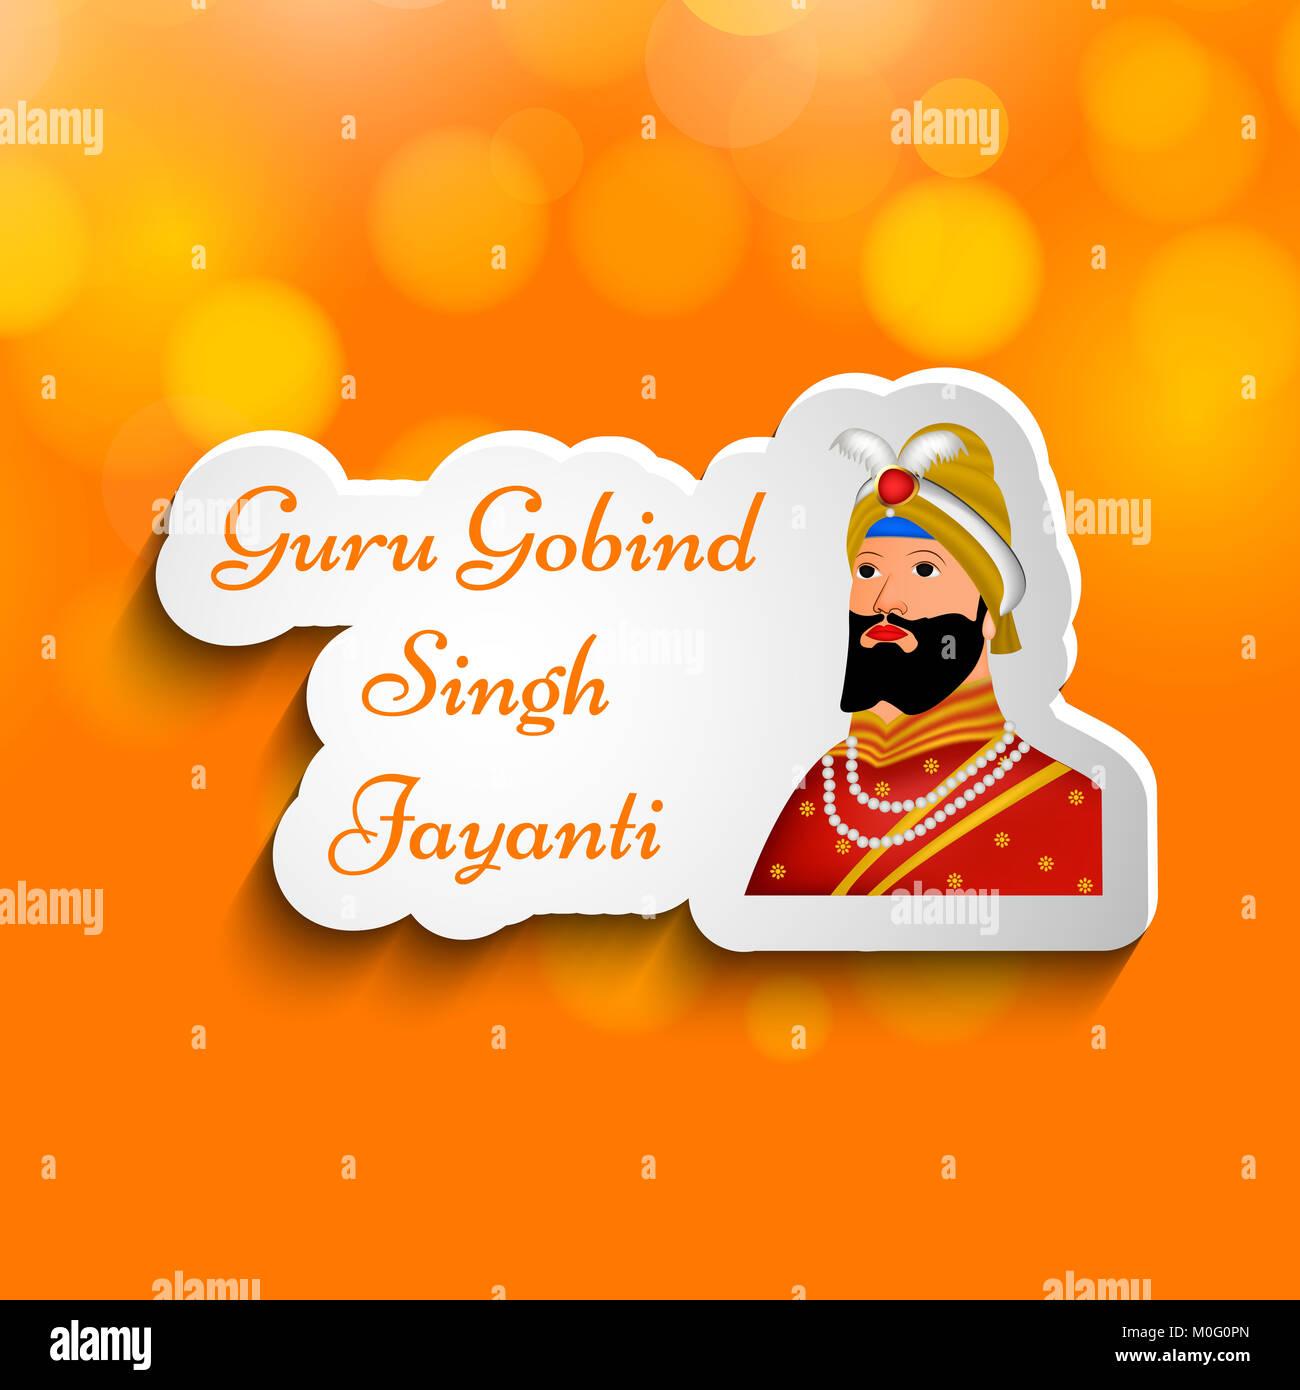 Illustration Of Elements Of Sikh Festival Guru Gobind Singh Jayanti